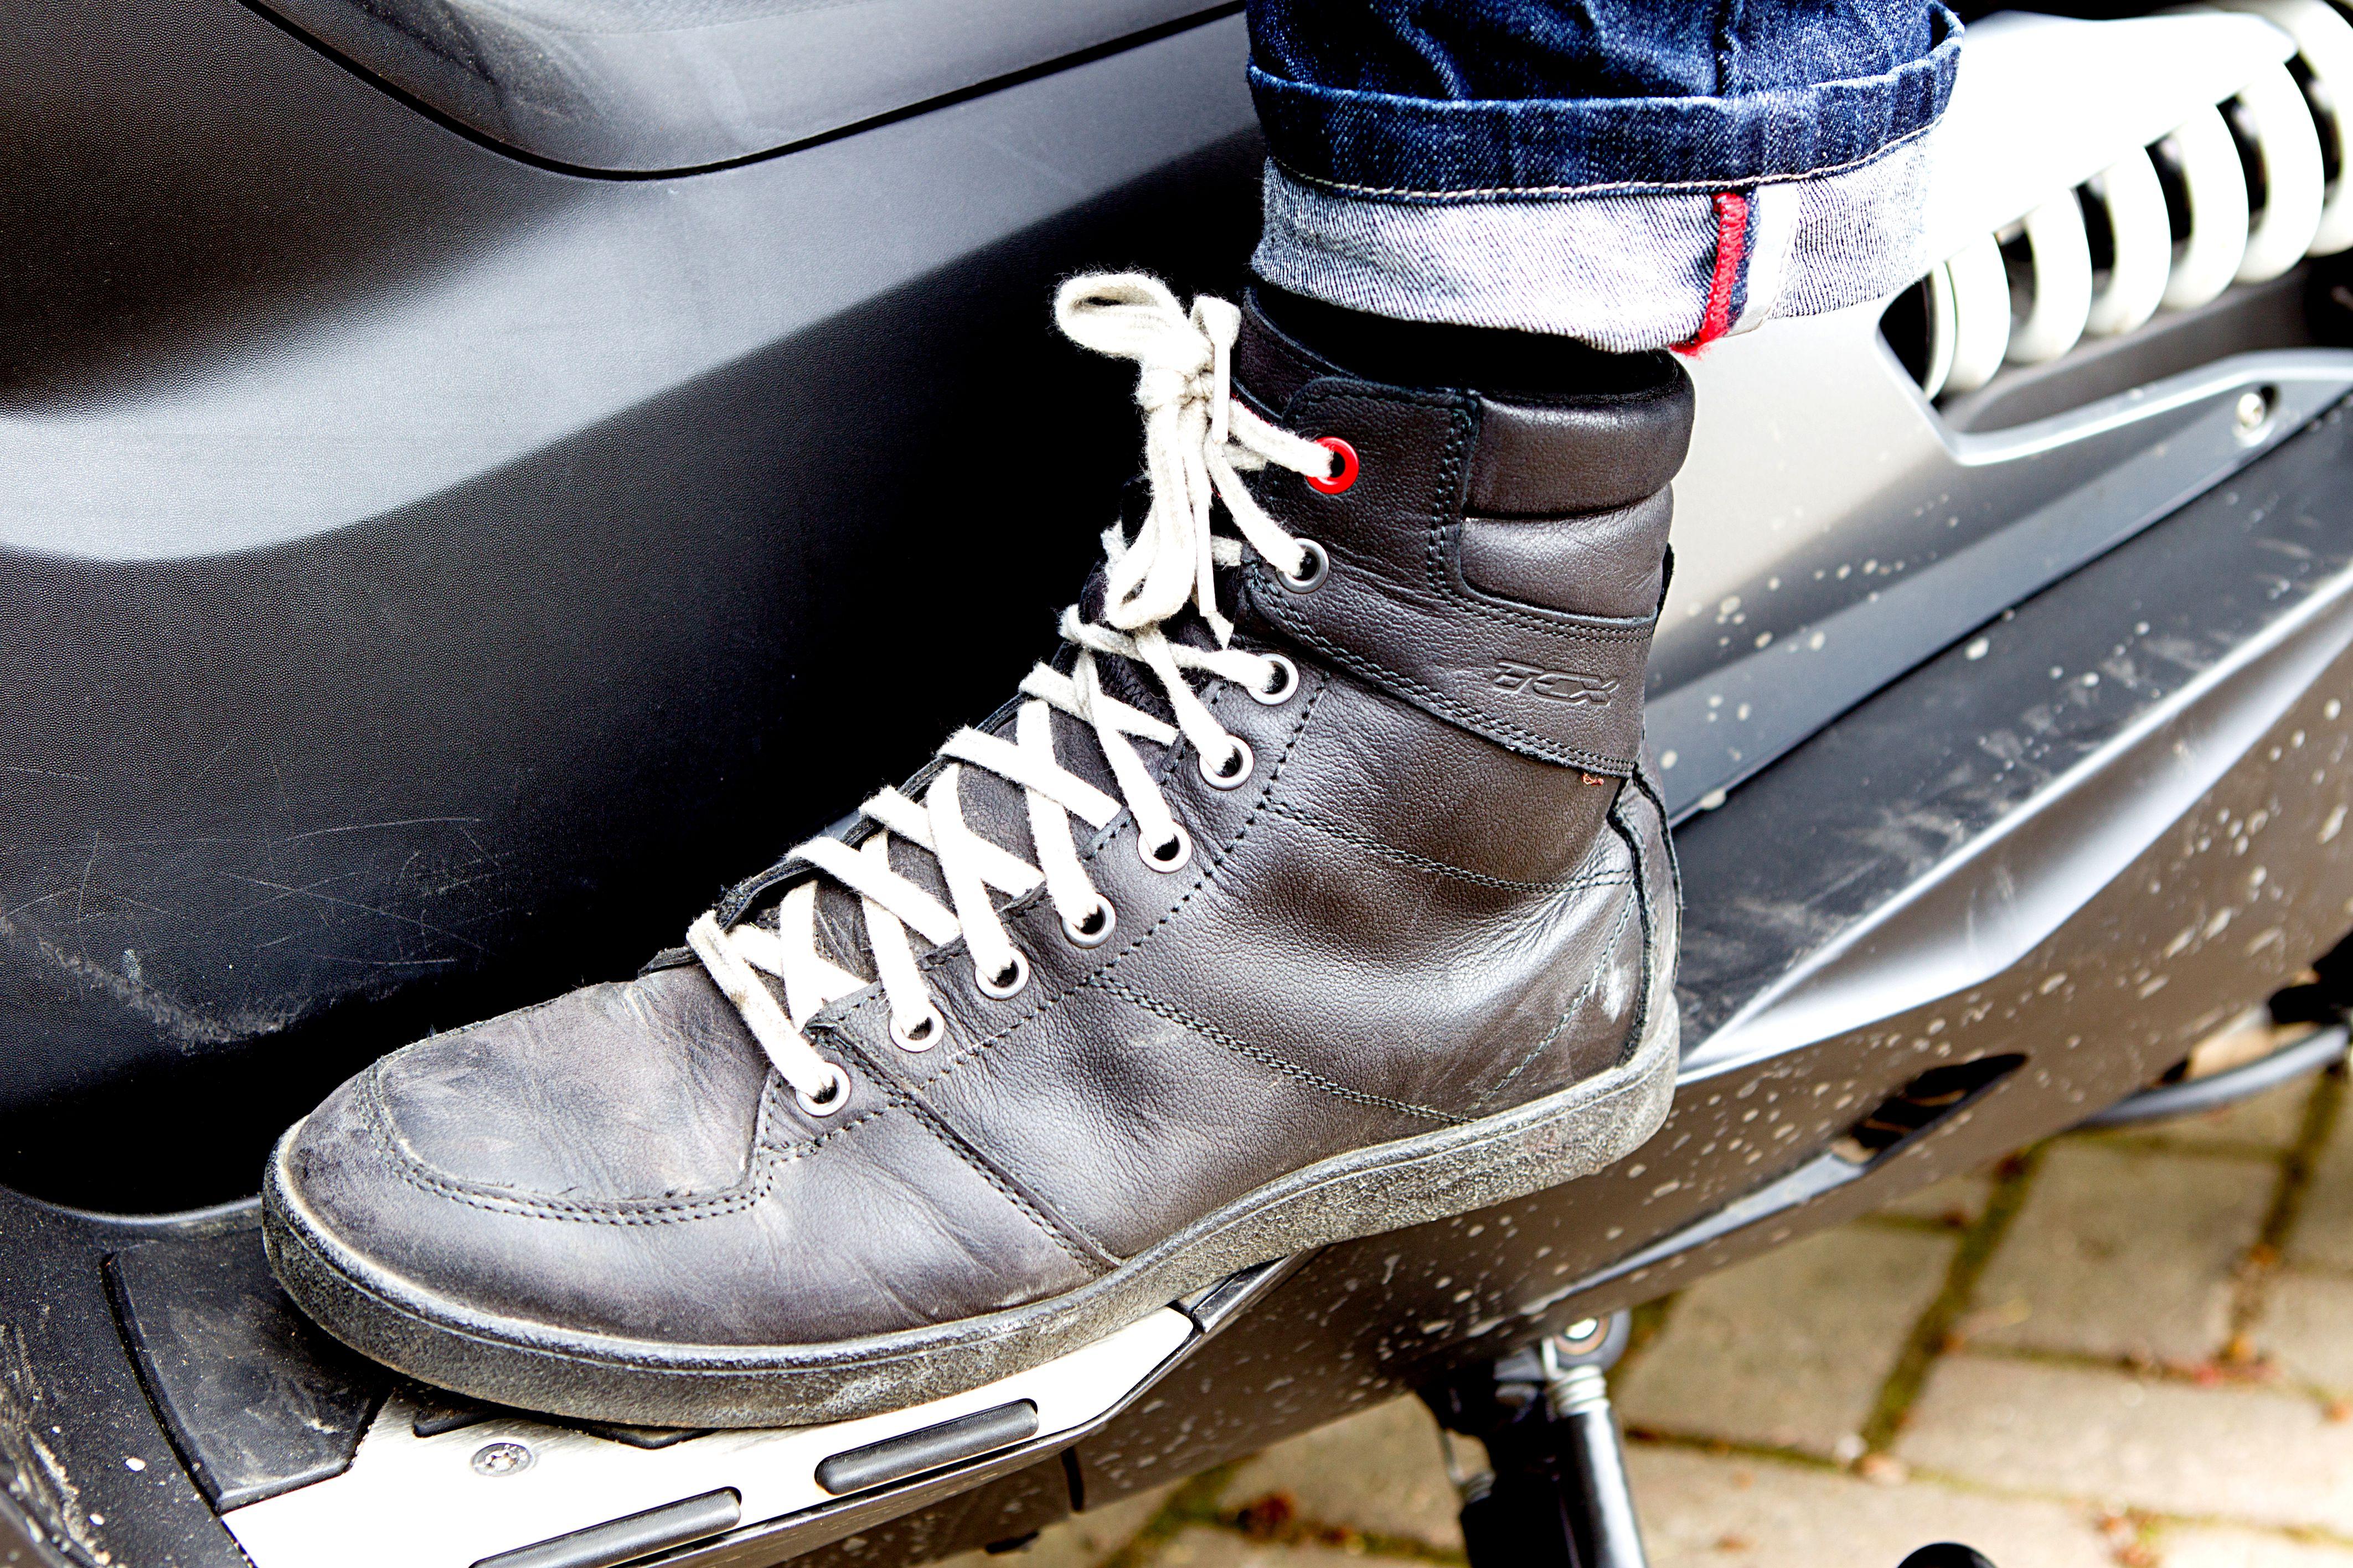 Tcx X Street Waterproof Leather Shoes